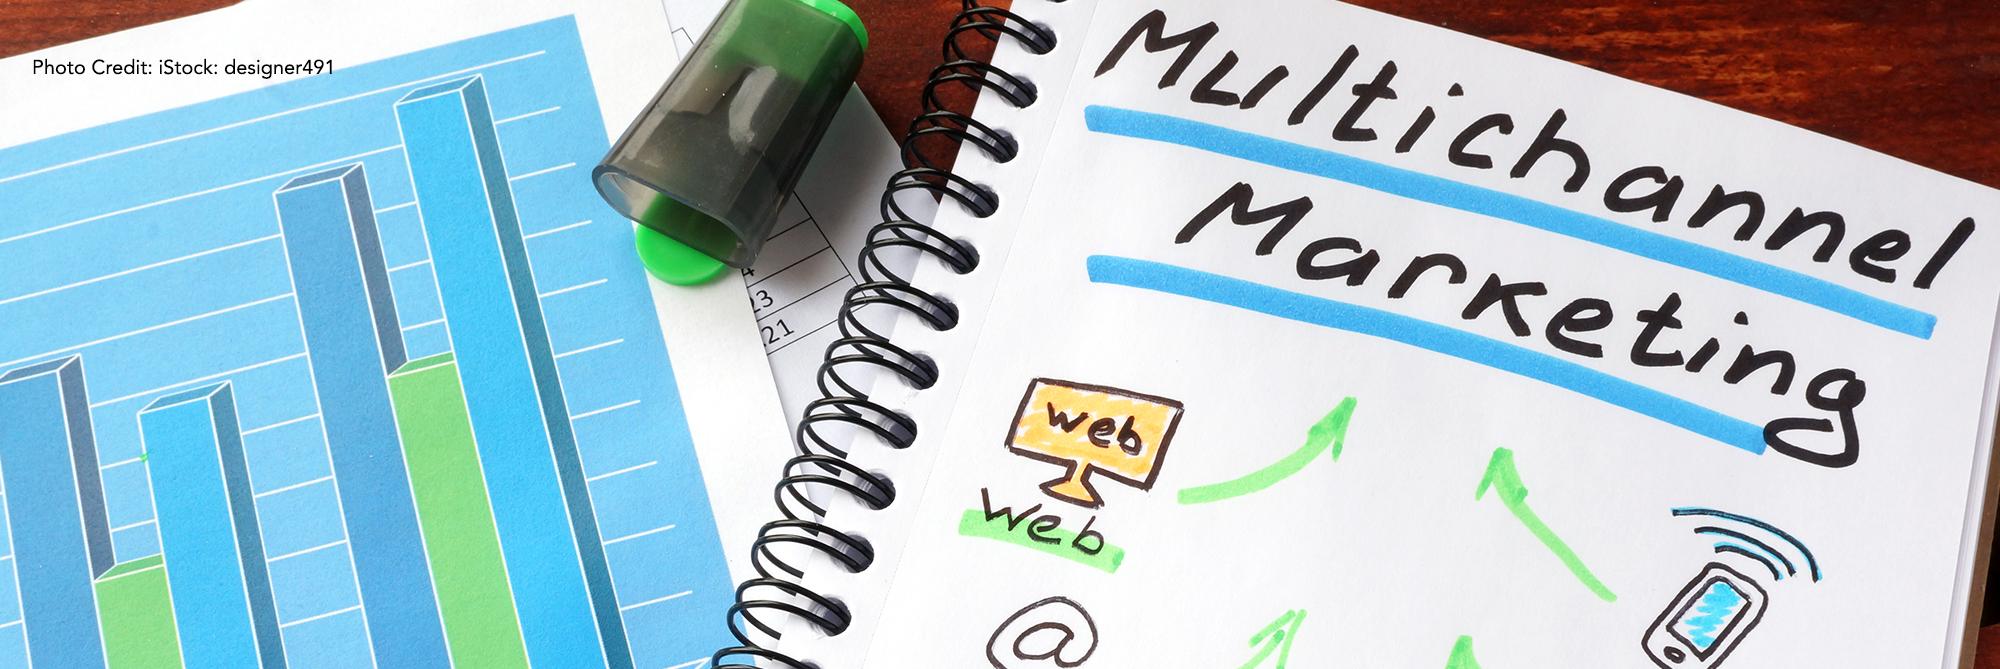 Multichannel Marketing Photo